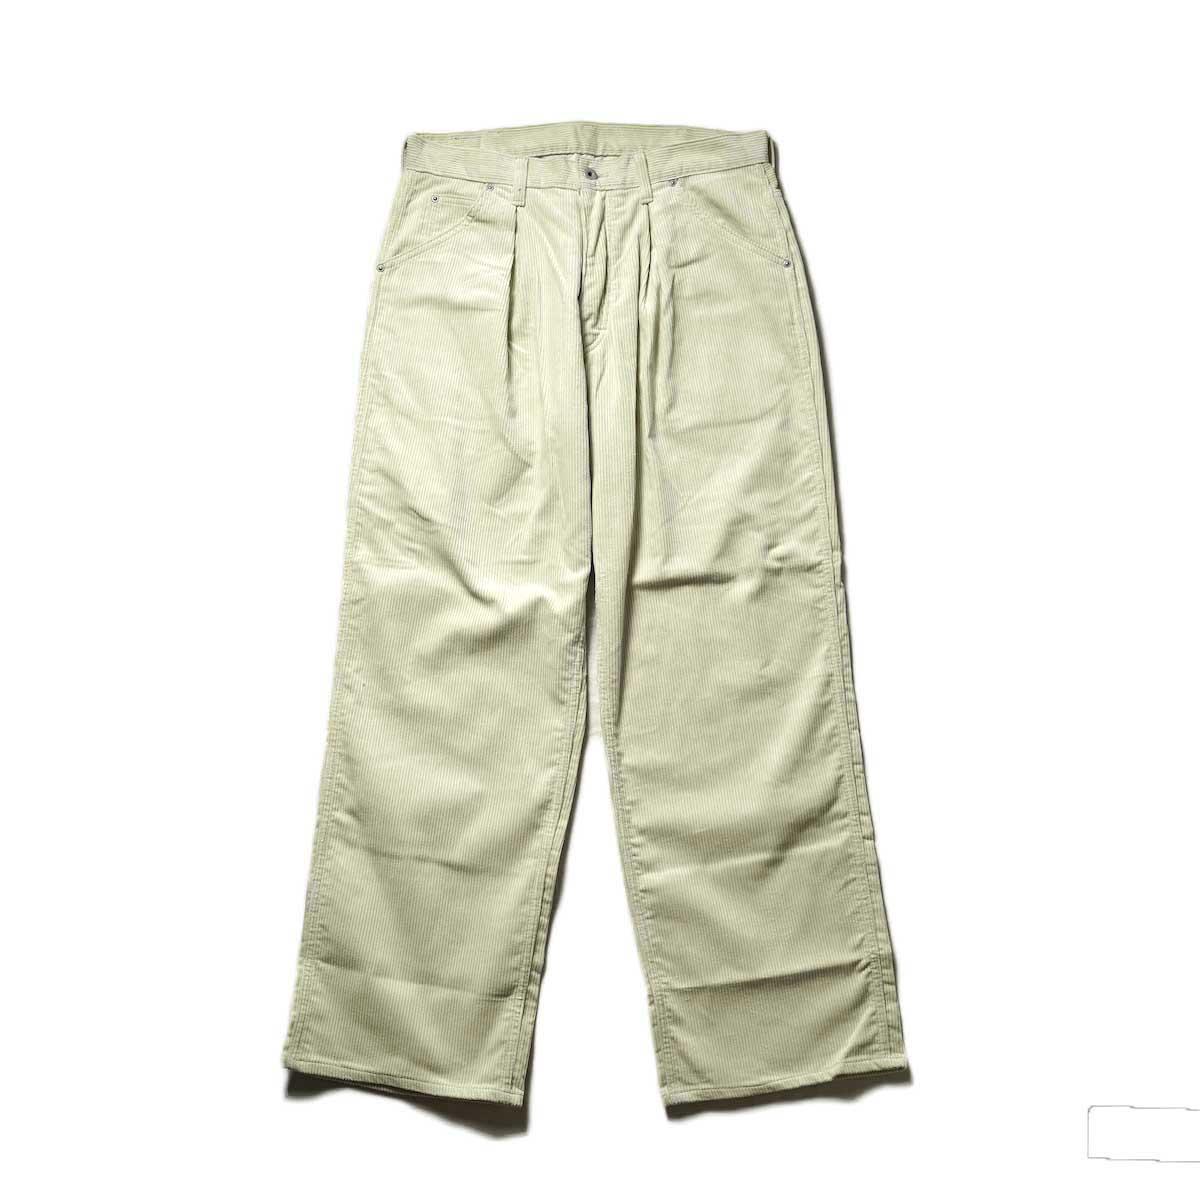 Willow Pants / P-010 - CORDUROY PANTS (Ivory)